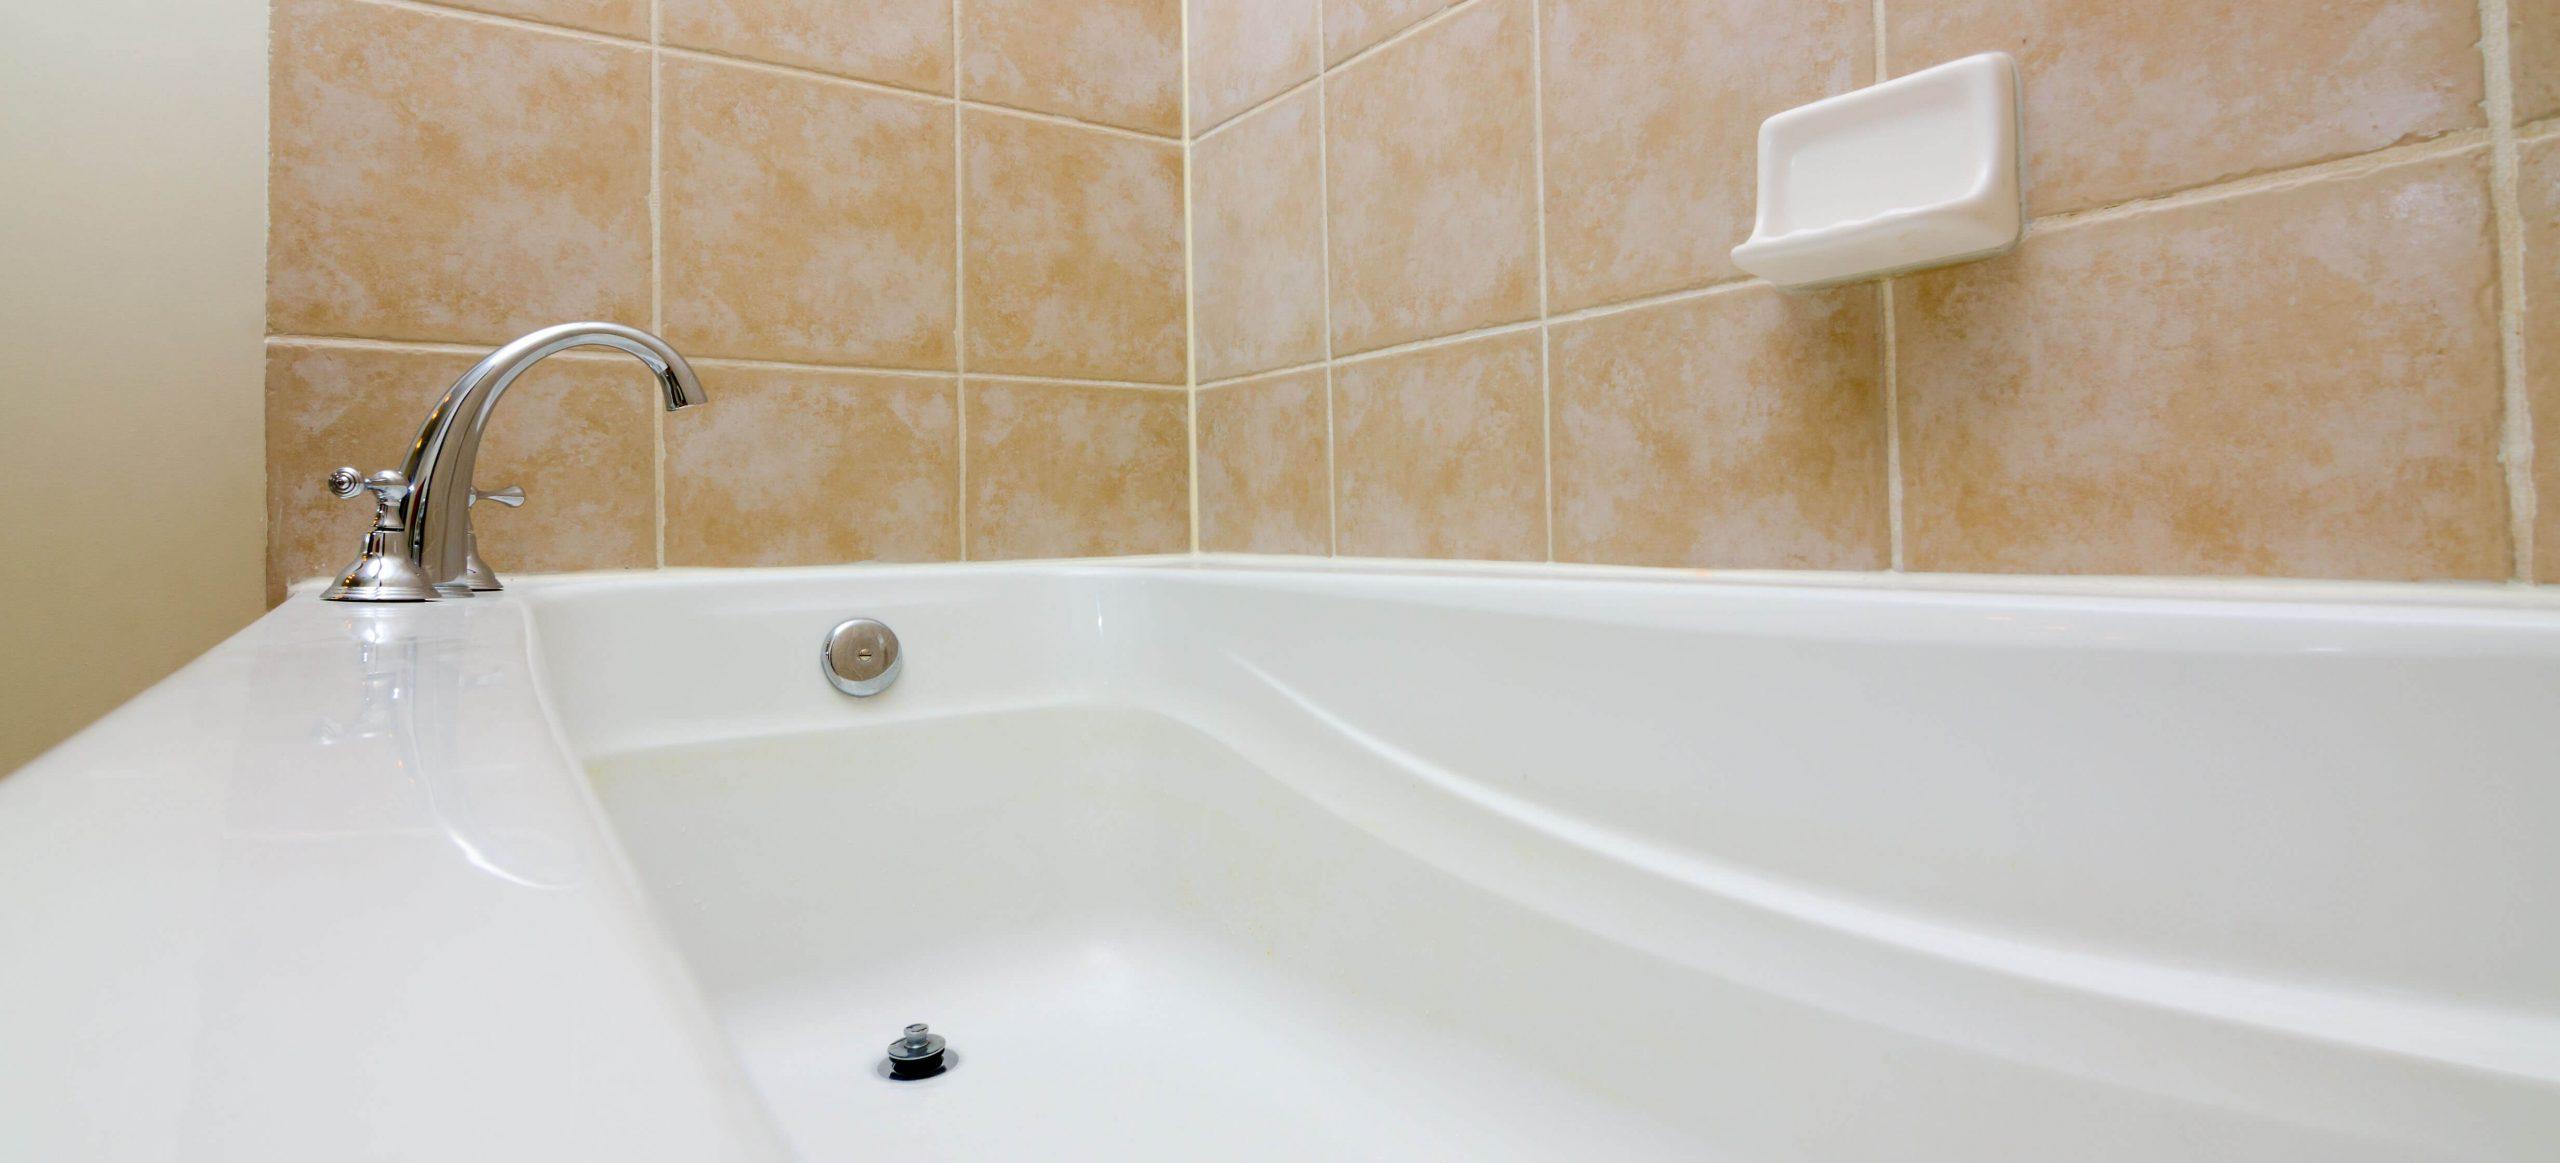 A clogged bathtub drain